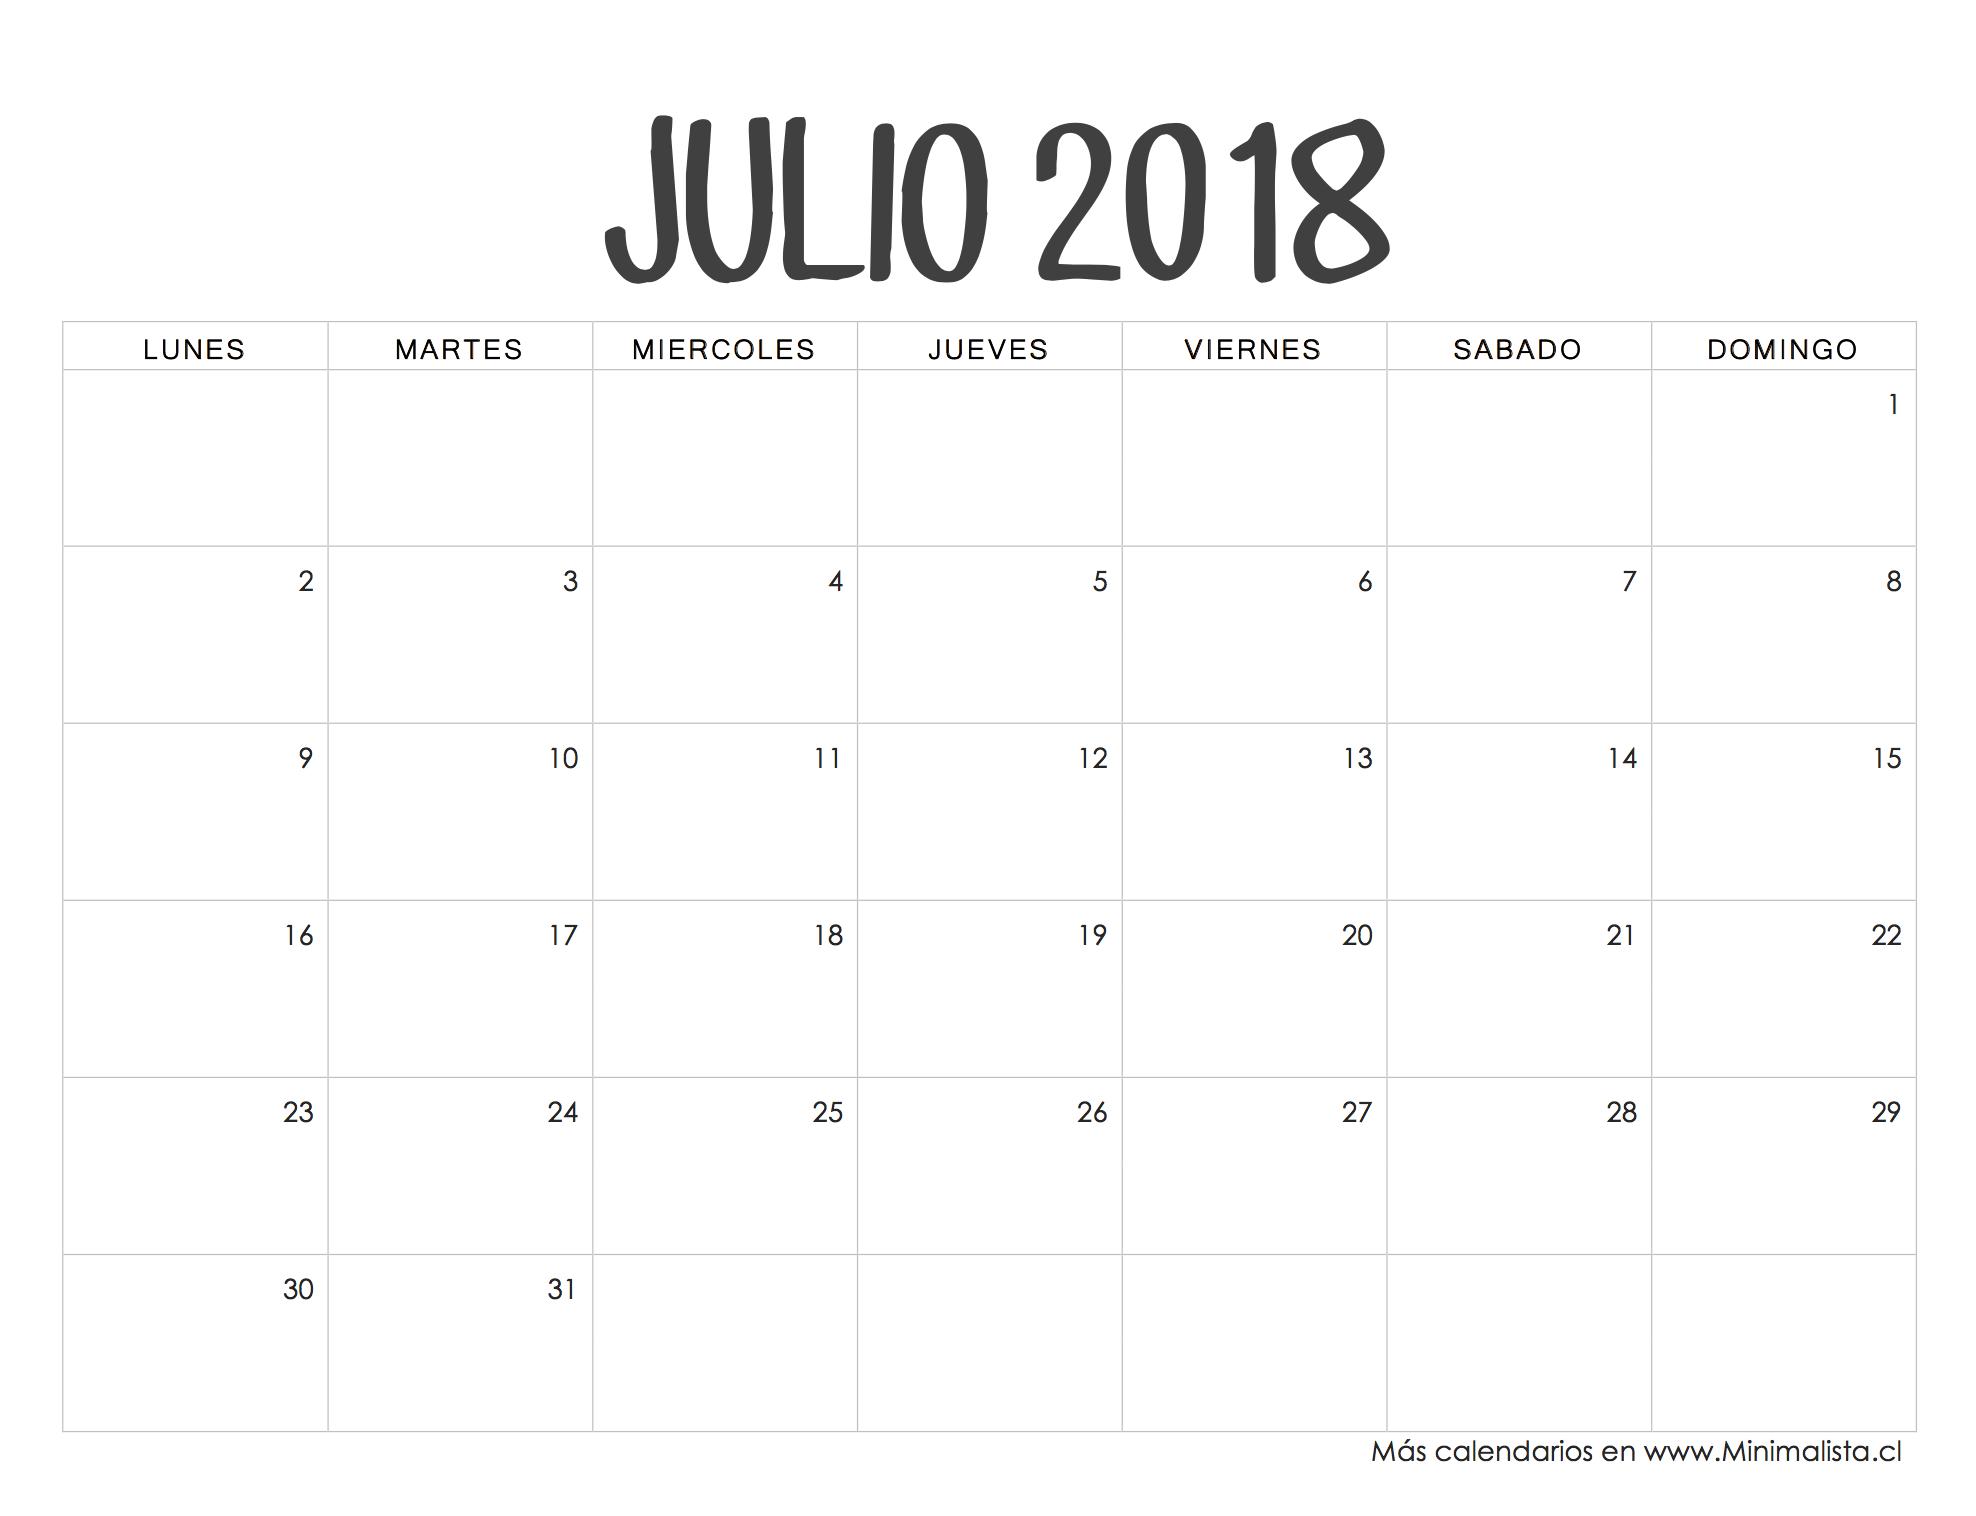 Julio Calendario.Calendario Julio 2019 Manualidades Calendario Julio Calendario